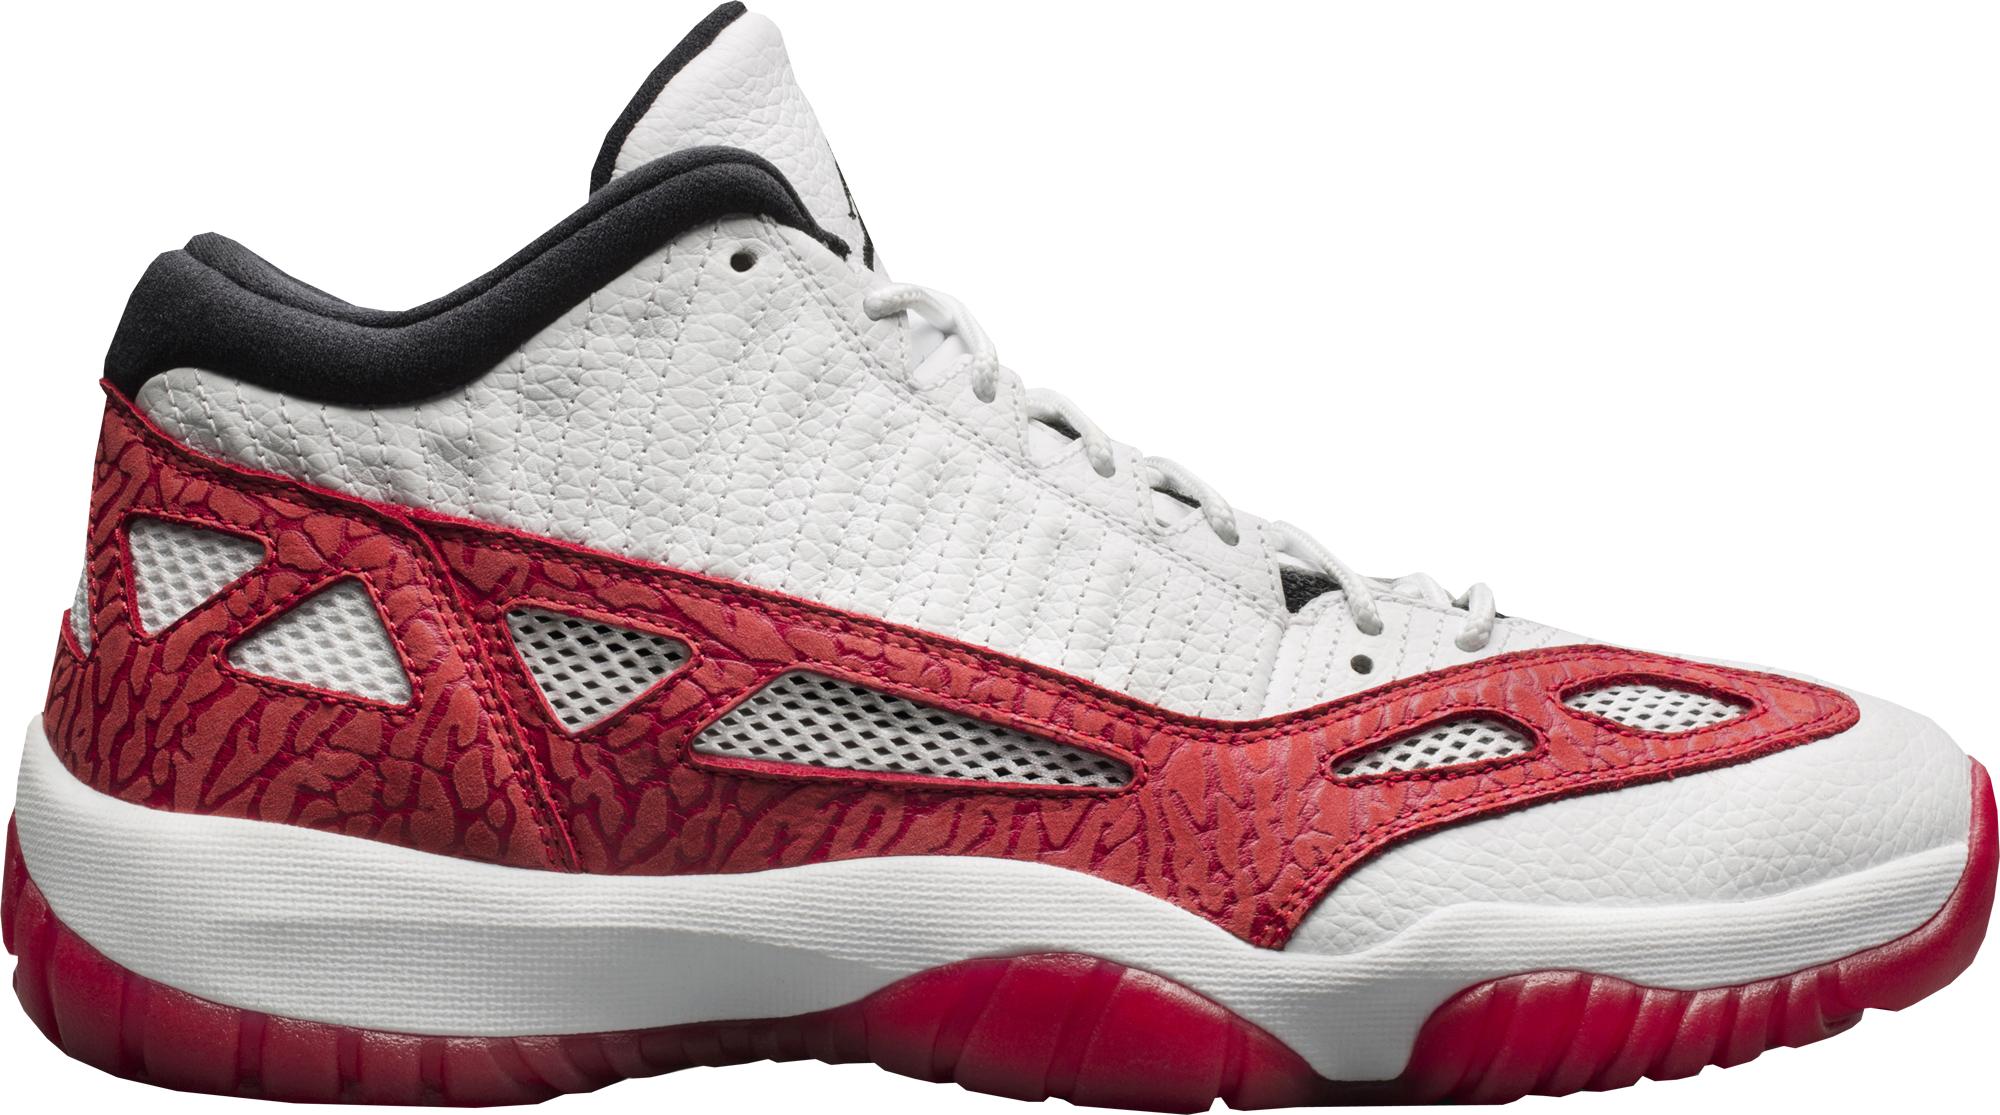 Jordan 11 Retro Low IE White Gym Red